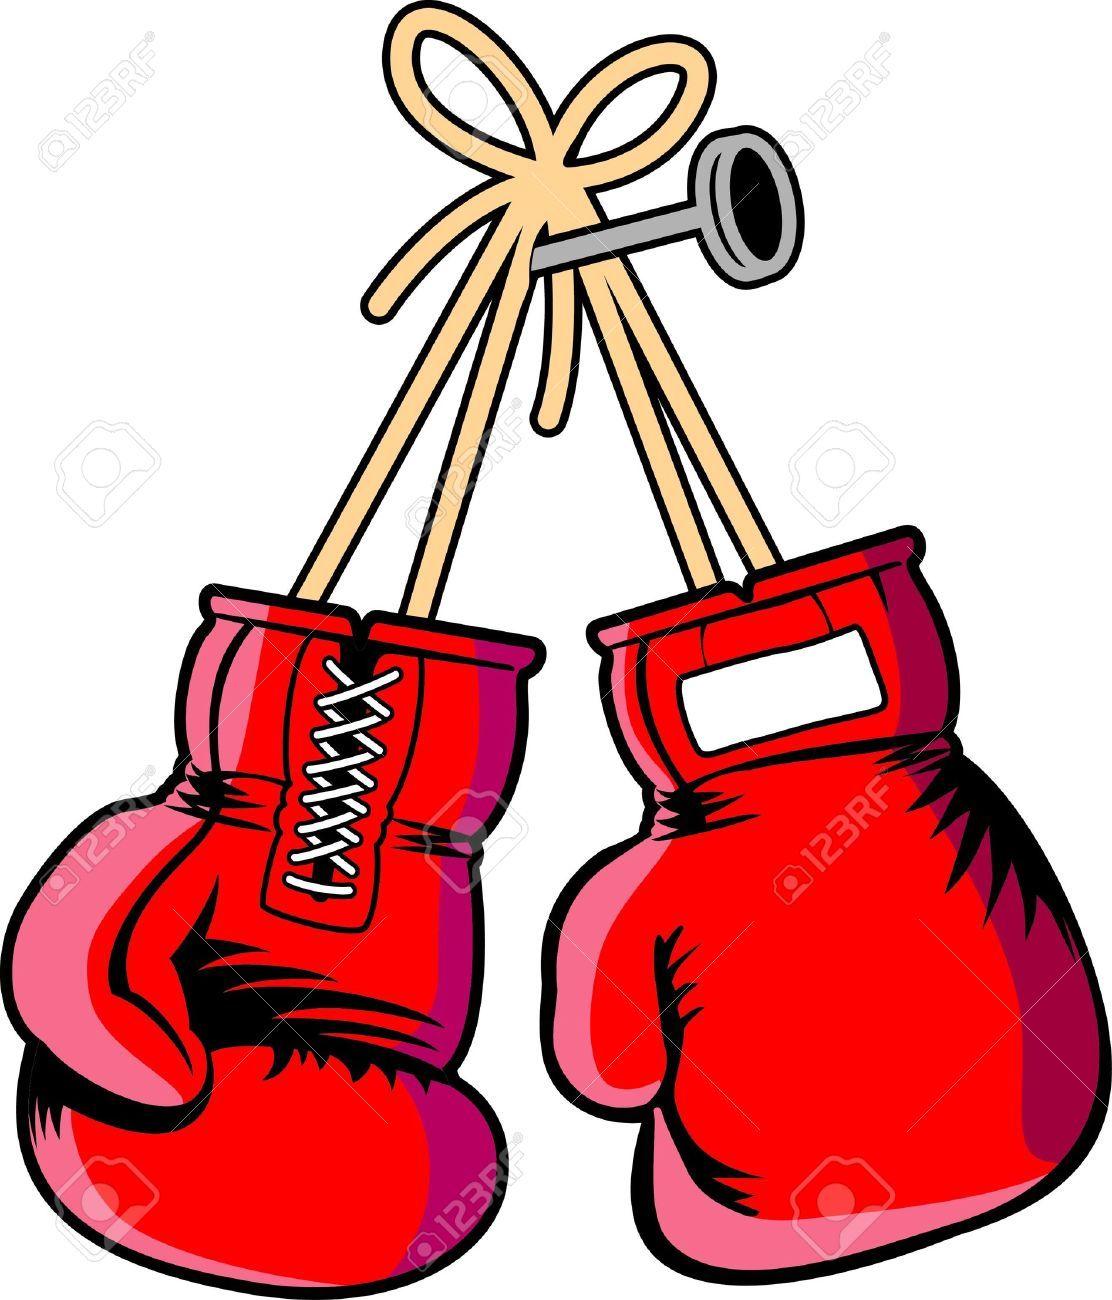 Boxing glove clipart free 6 » Clipart Portal.